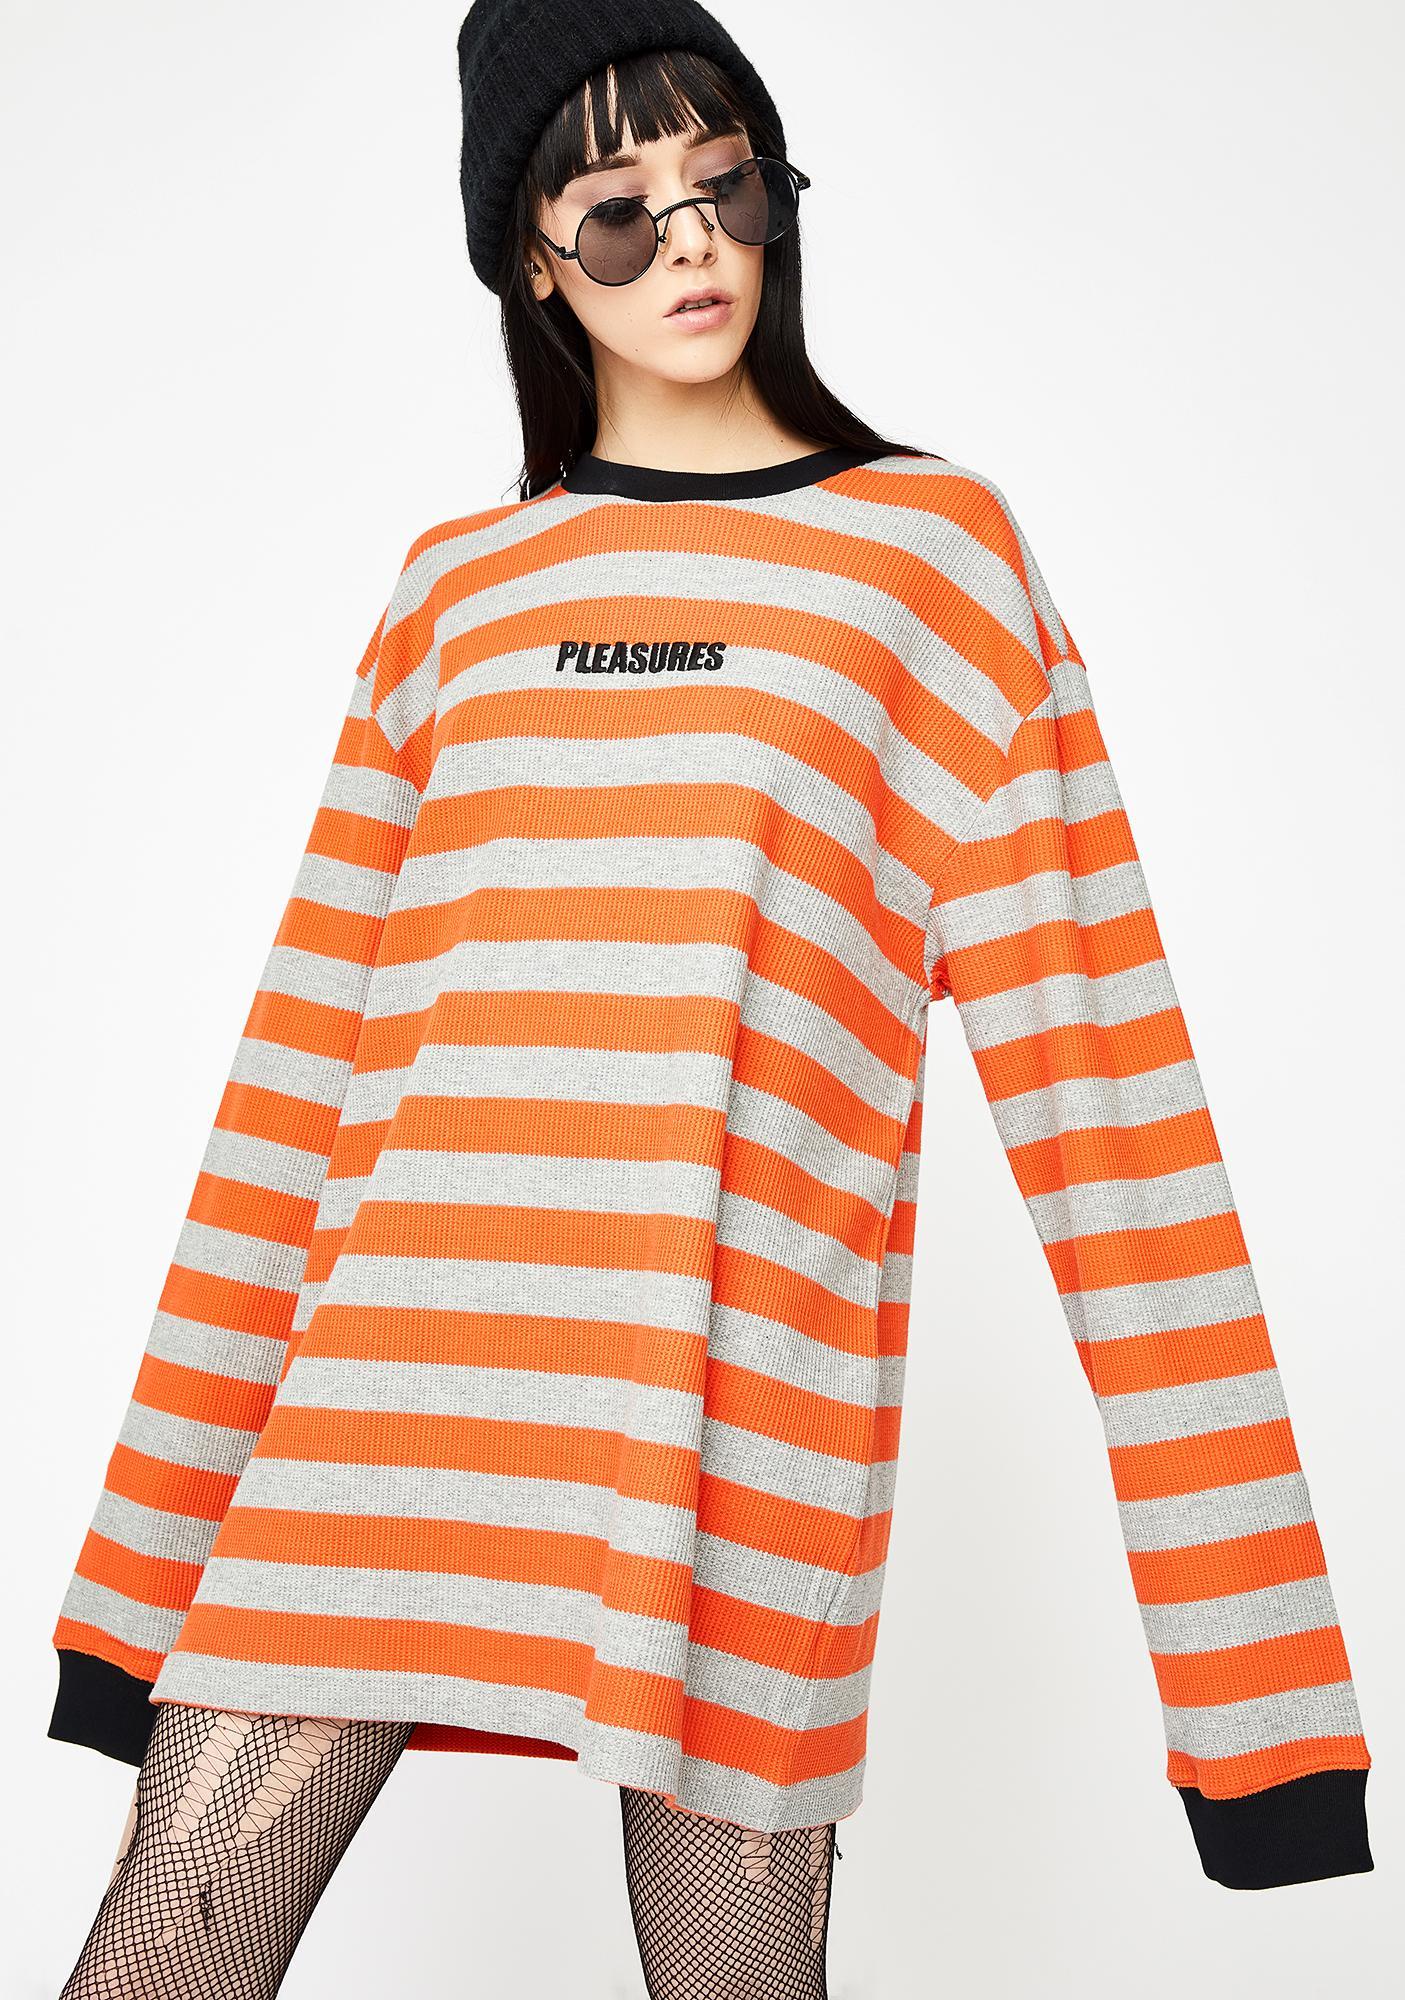 Pleasures Parade Waffle Knit Long Sleeve Shirt